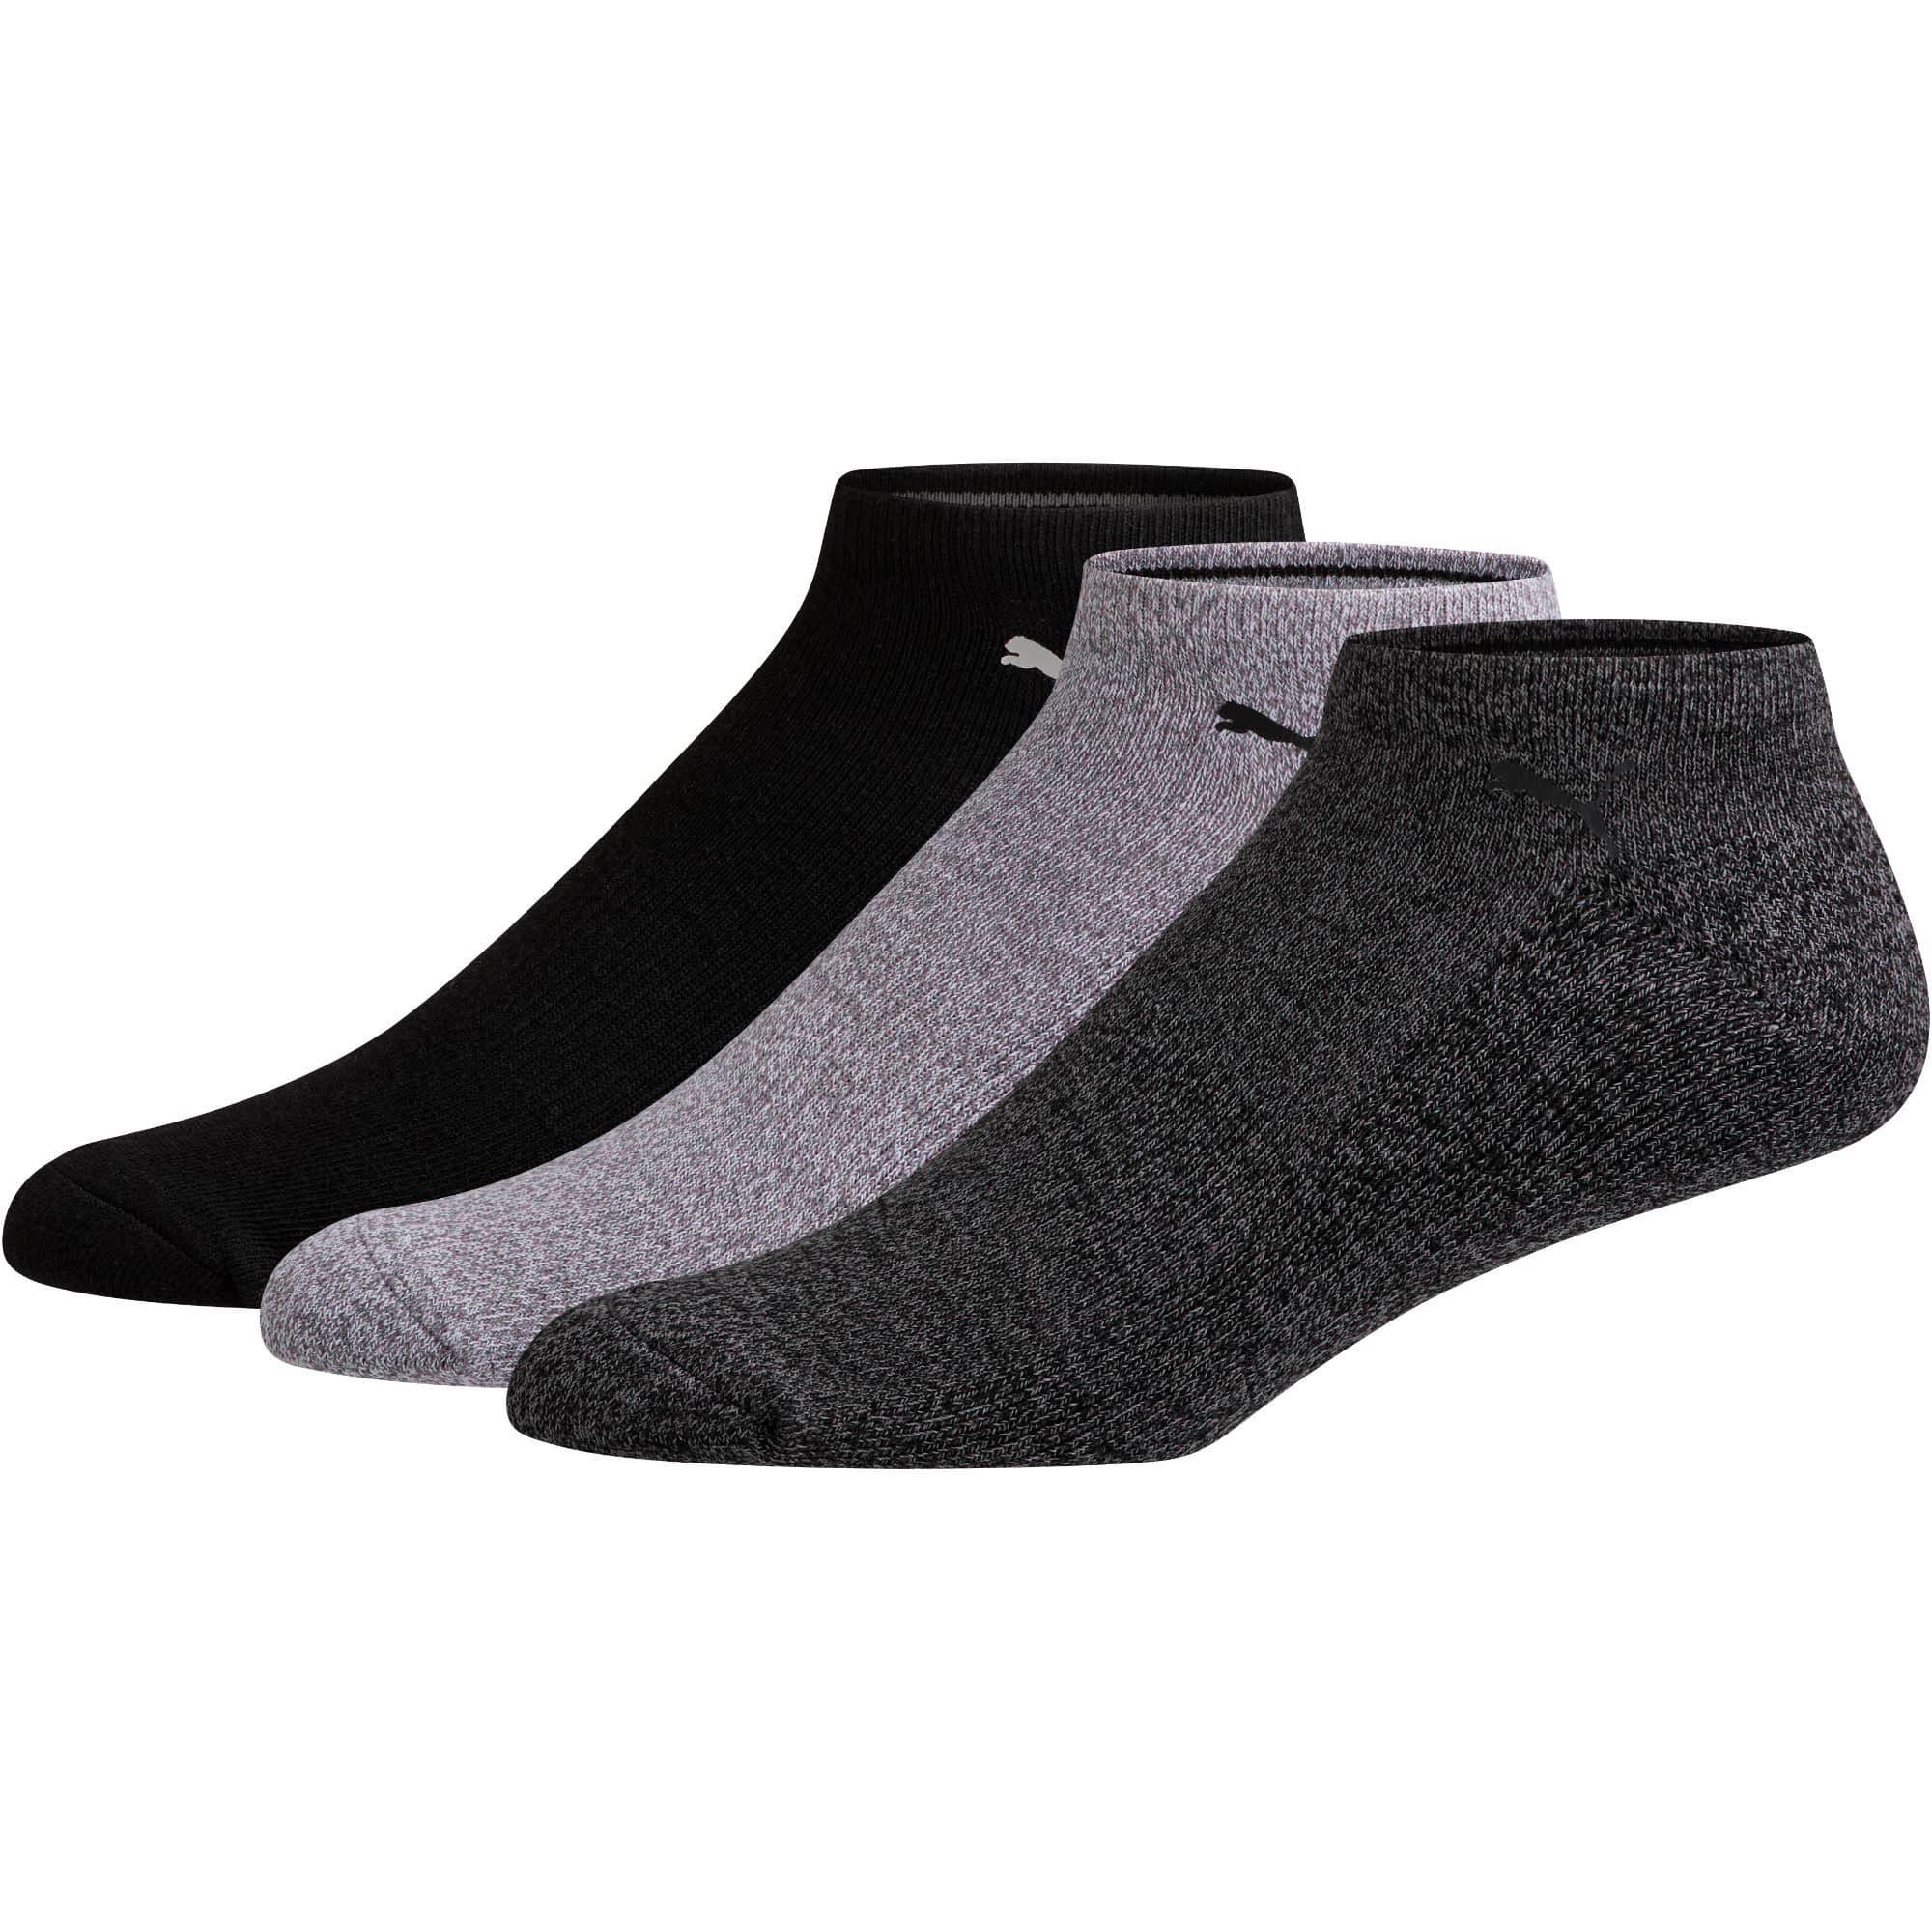 Thumbnail 1 of Men's No Show Socks [3 Pack], GREY / BLACK, medium